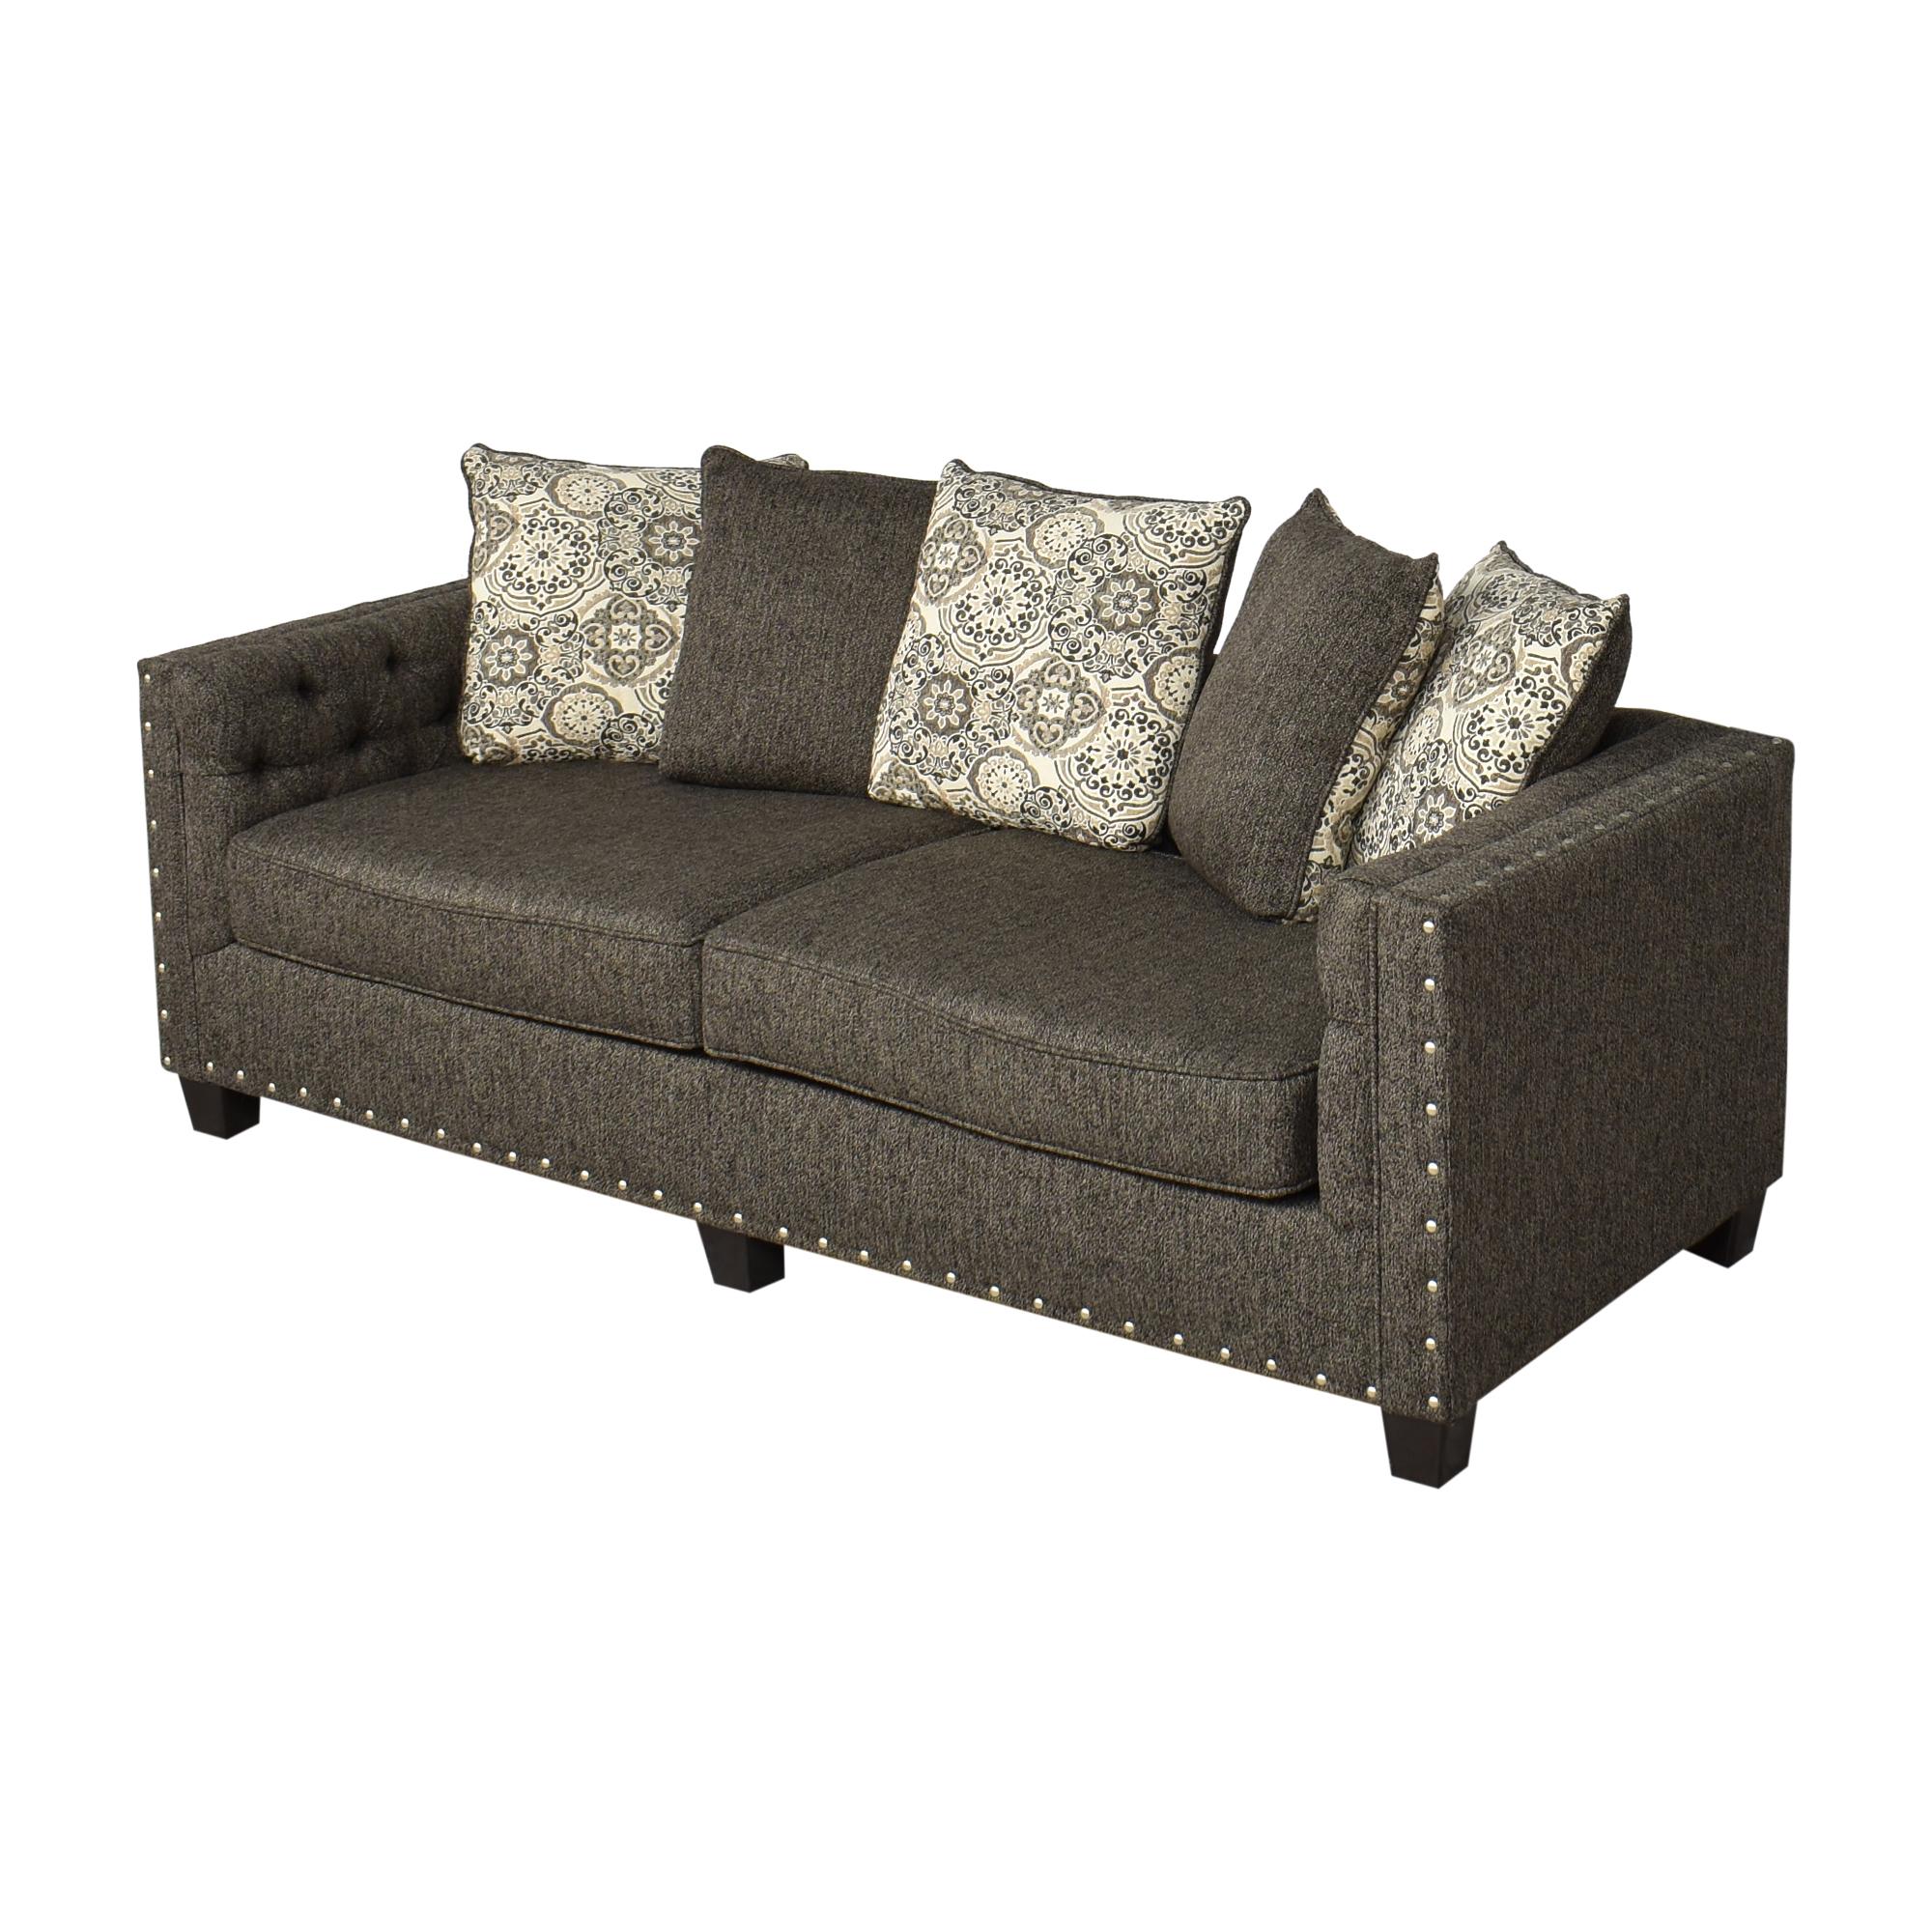 Hughes Furniture Hughes Furniture Nailhead Sofa dimensions